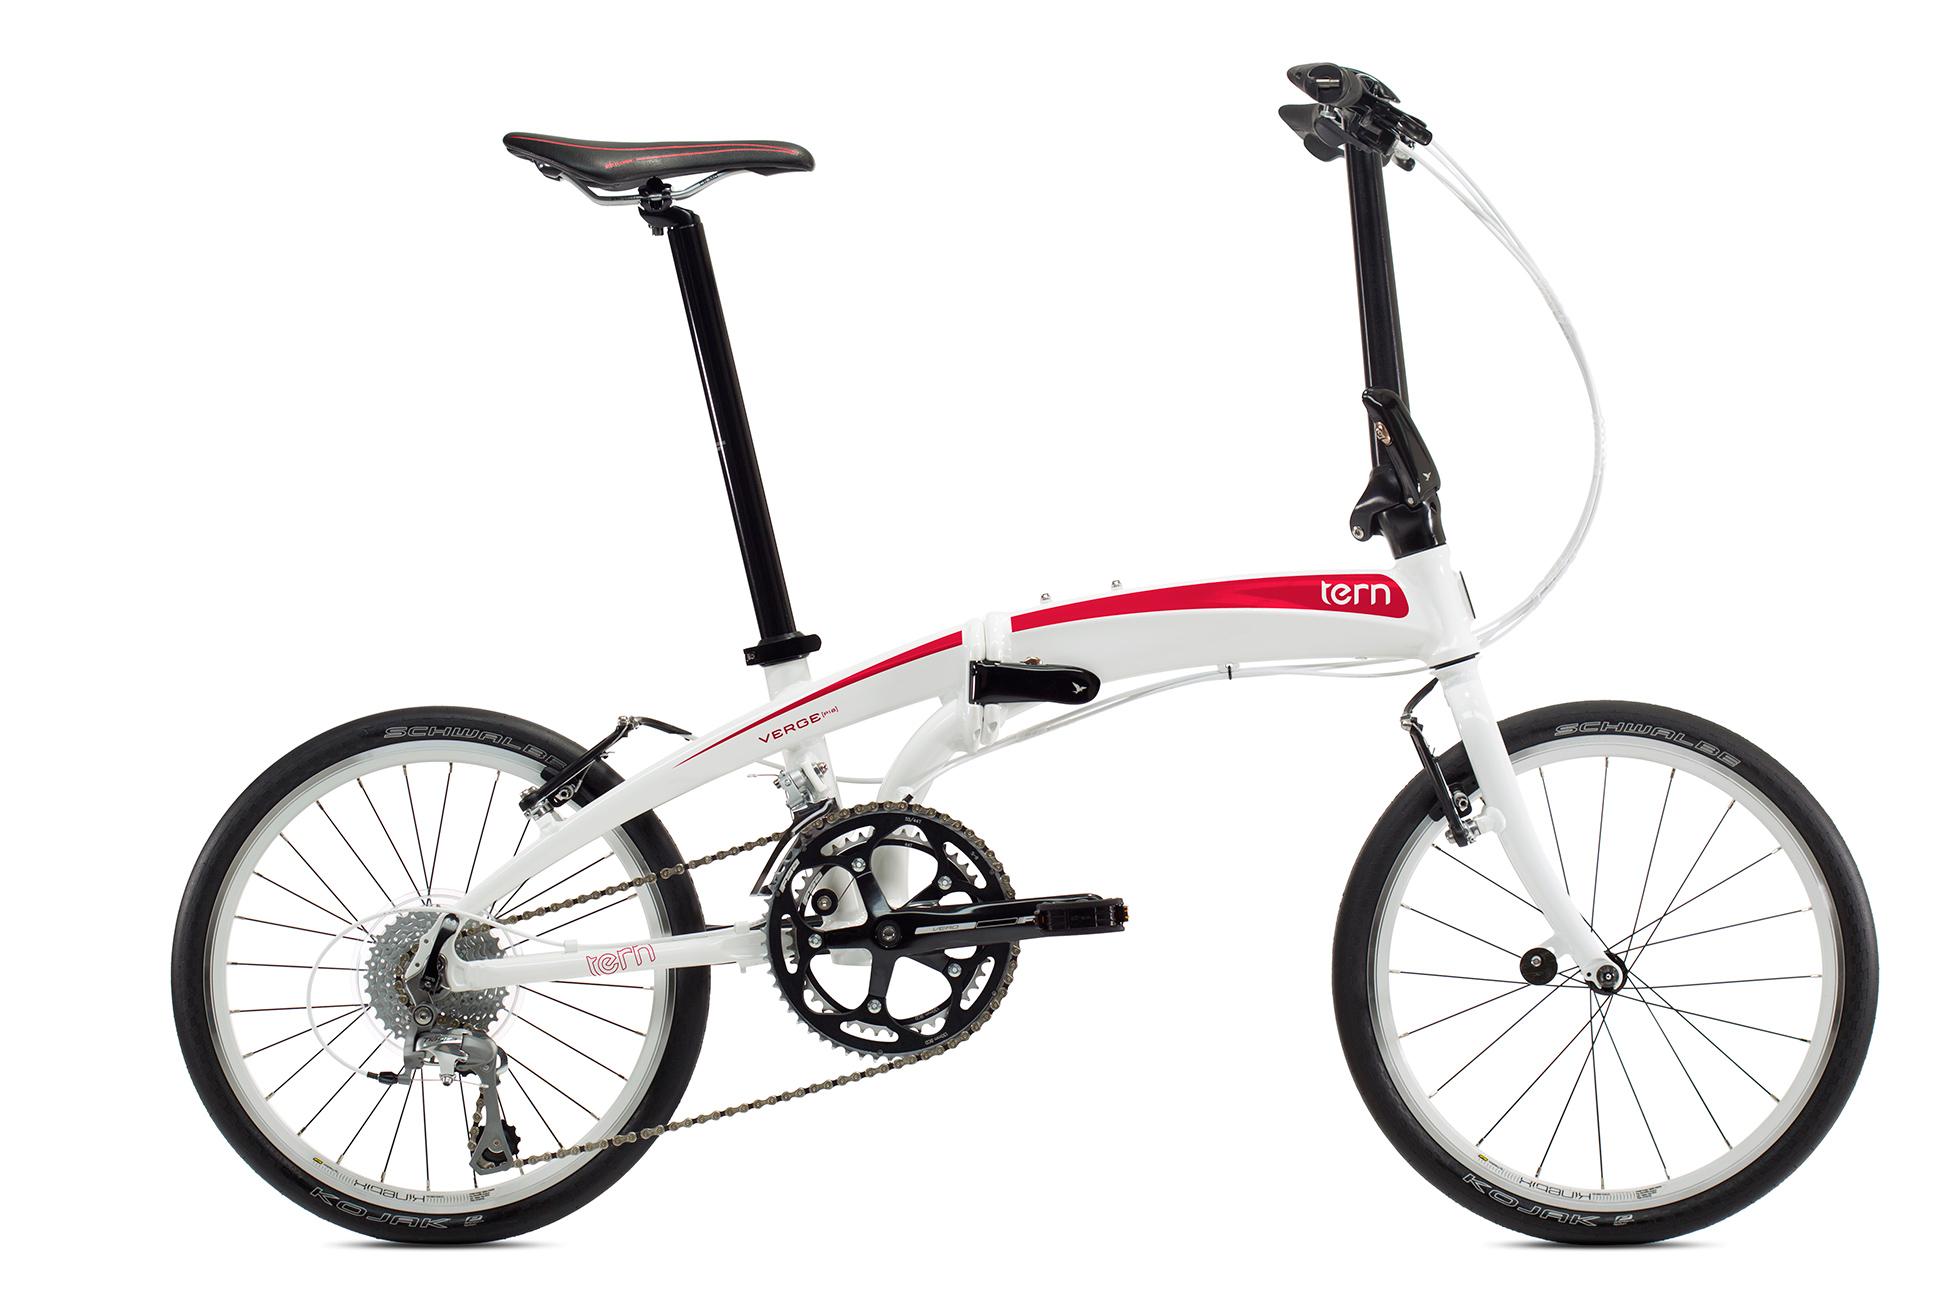 Verge P18 Tern Folding Bikes Philippines